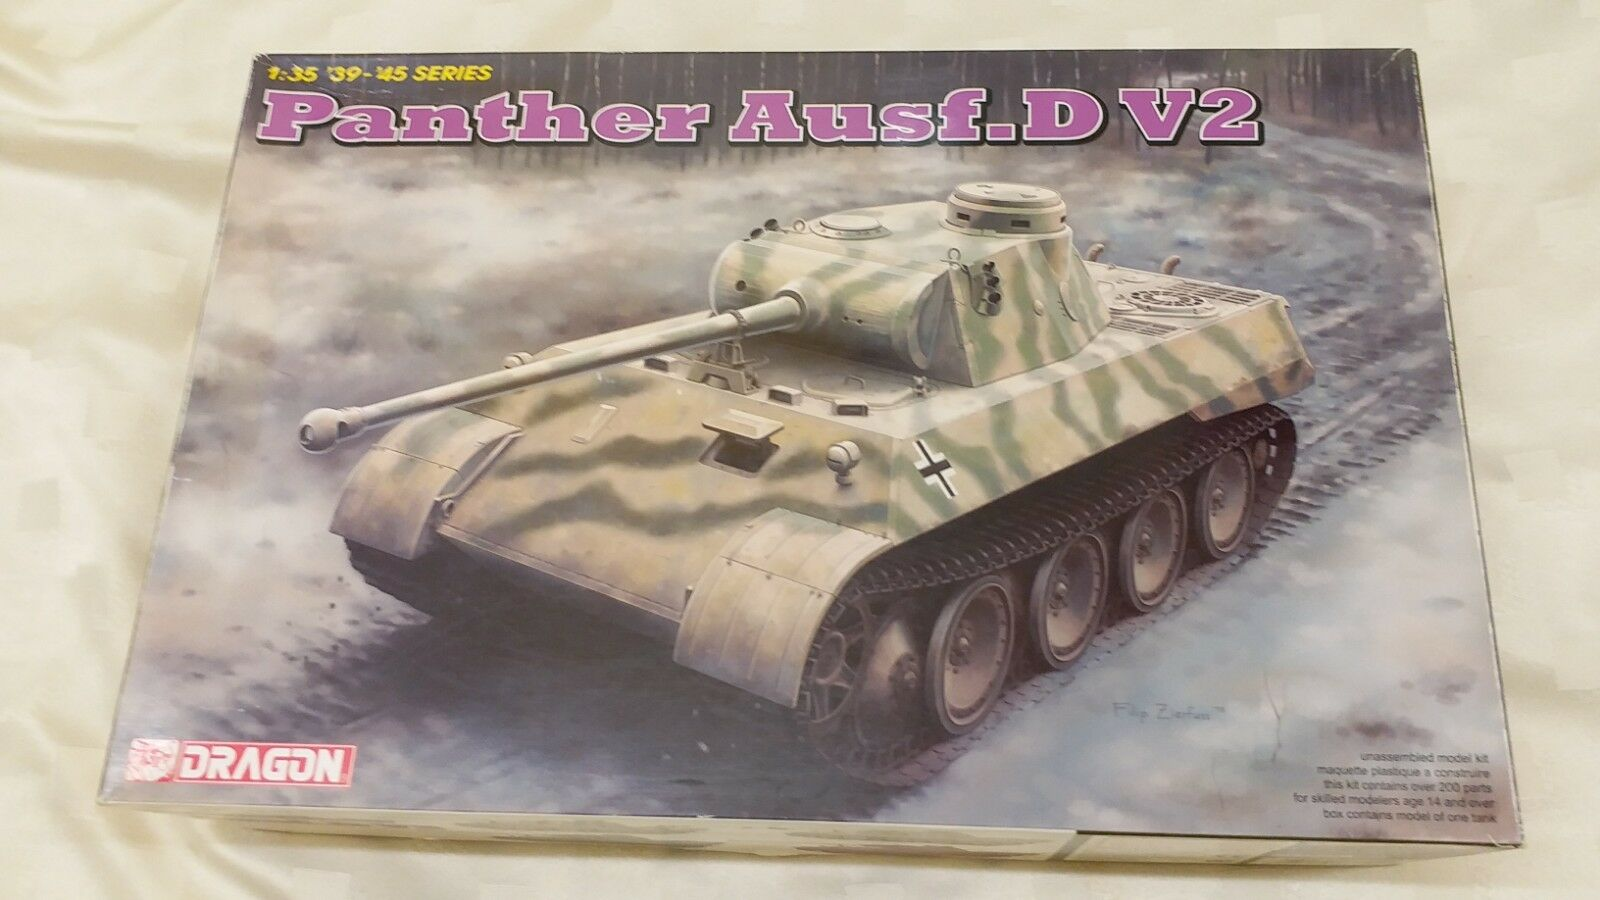 DRAGON 1 35 PANTHER Ausf.D V2 Medium Tank Model Kit BNIB